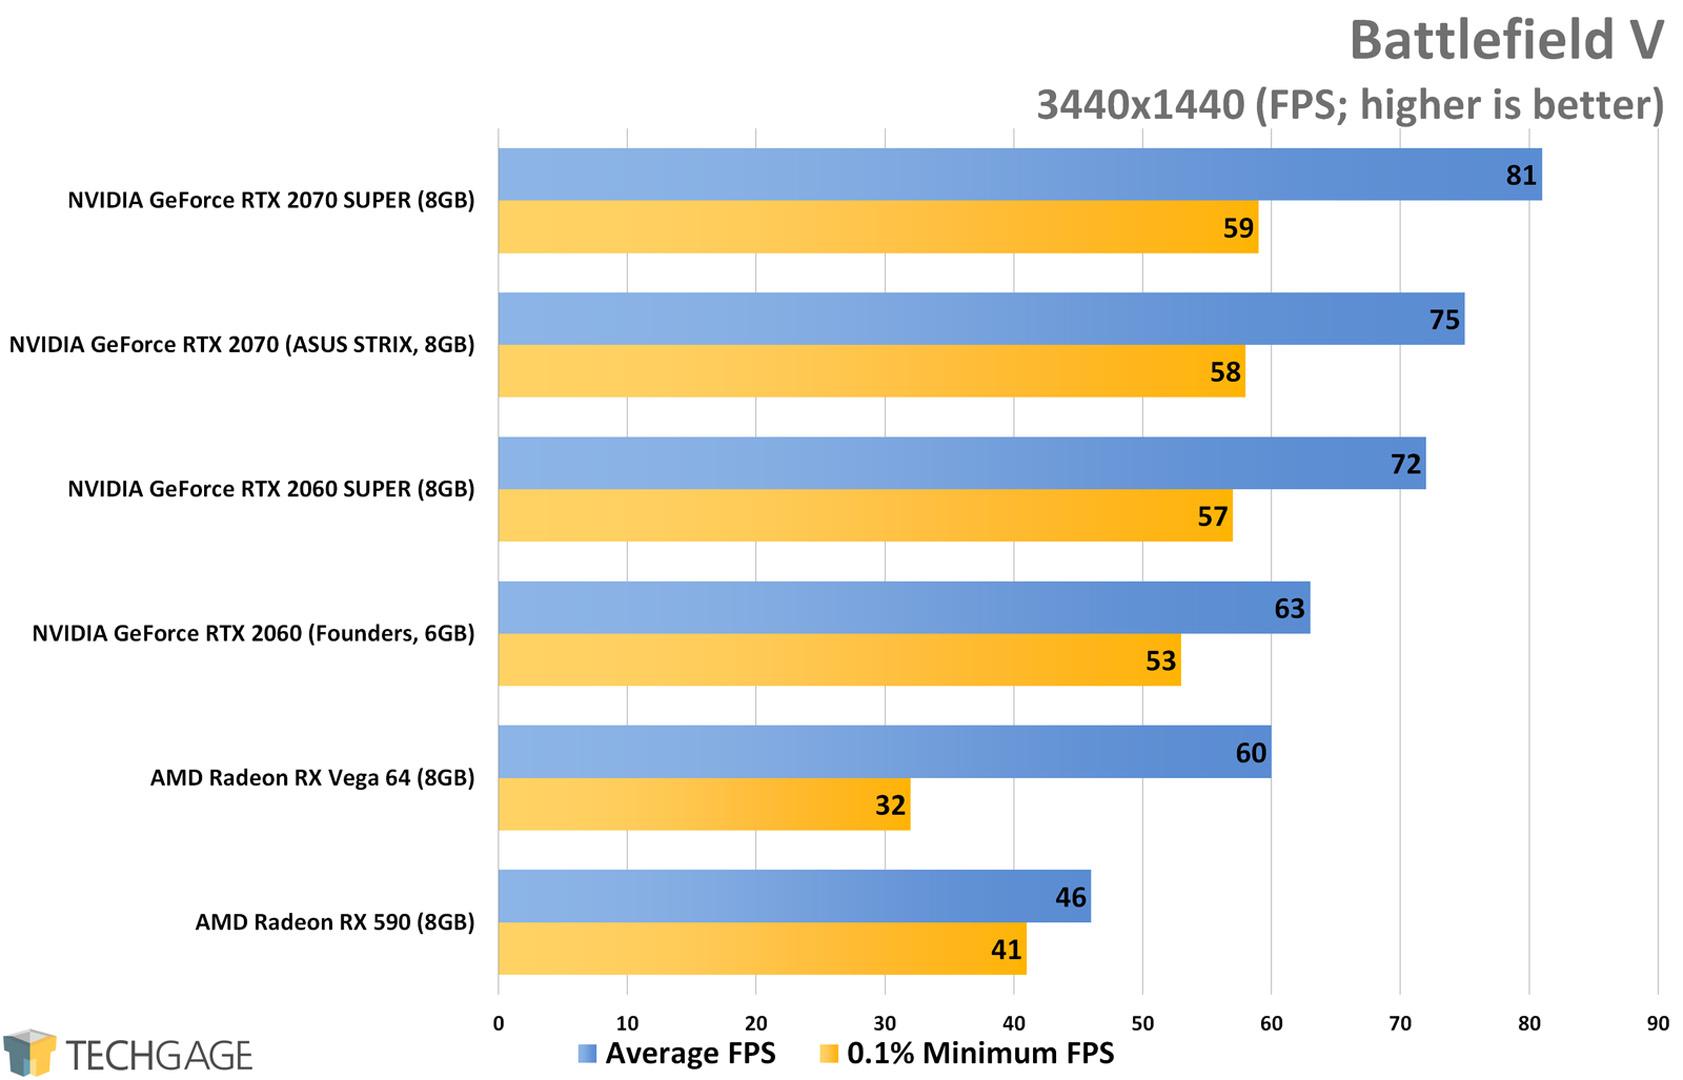 Battlefield V (3440x1440 Ultrawide) - NVIDIA RTX SUPER 2060 and 2070 Performance